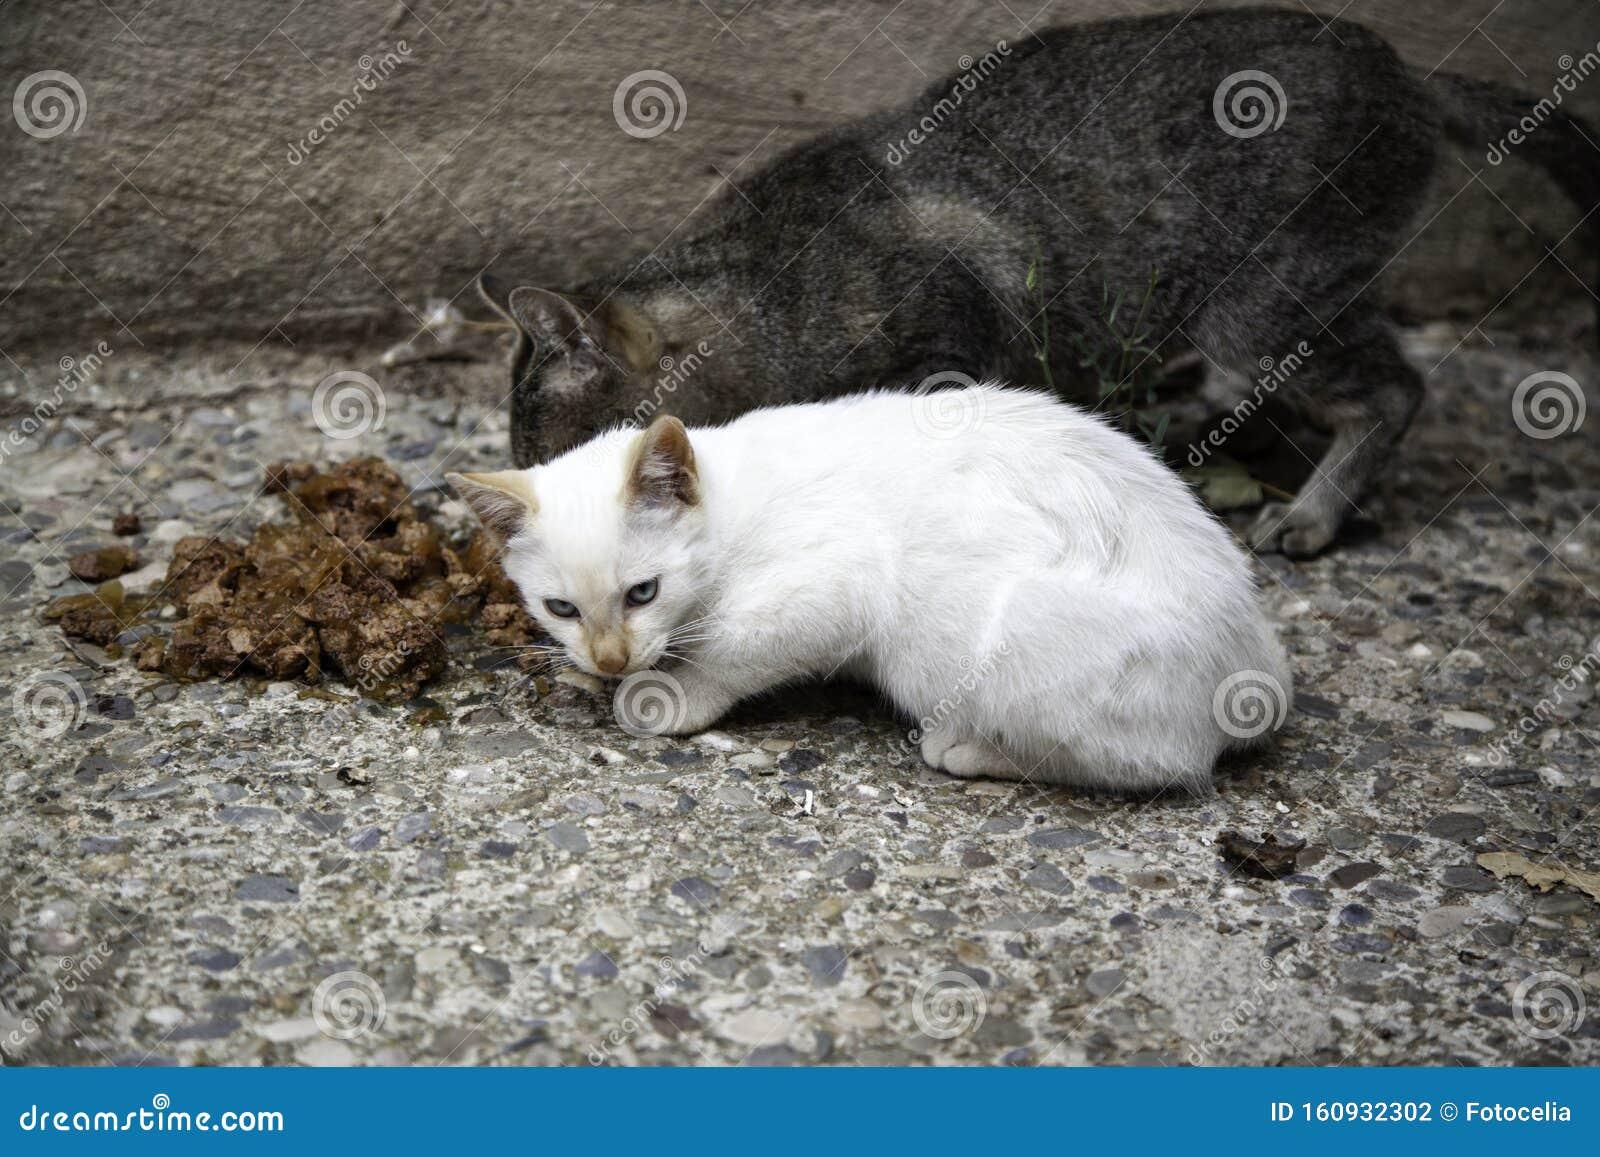 Street cats eating stock photo. Image of animal, playful ...